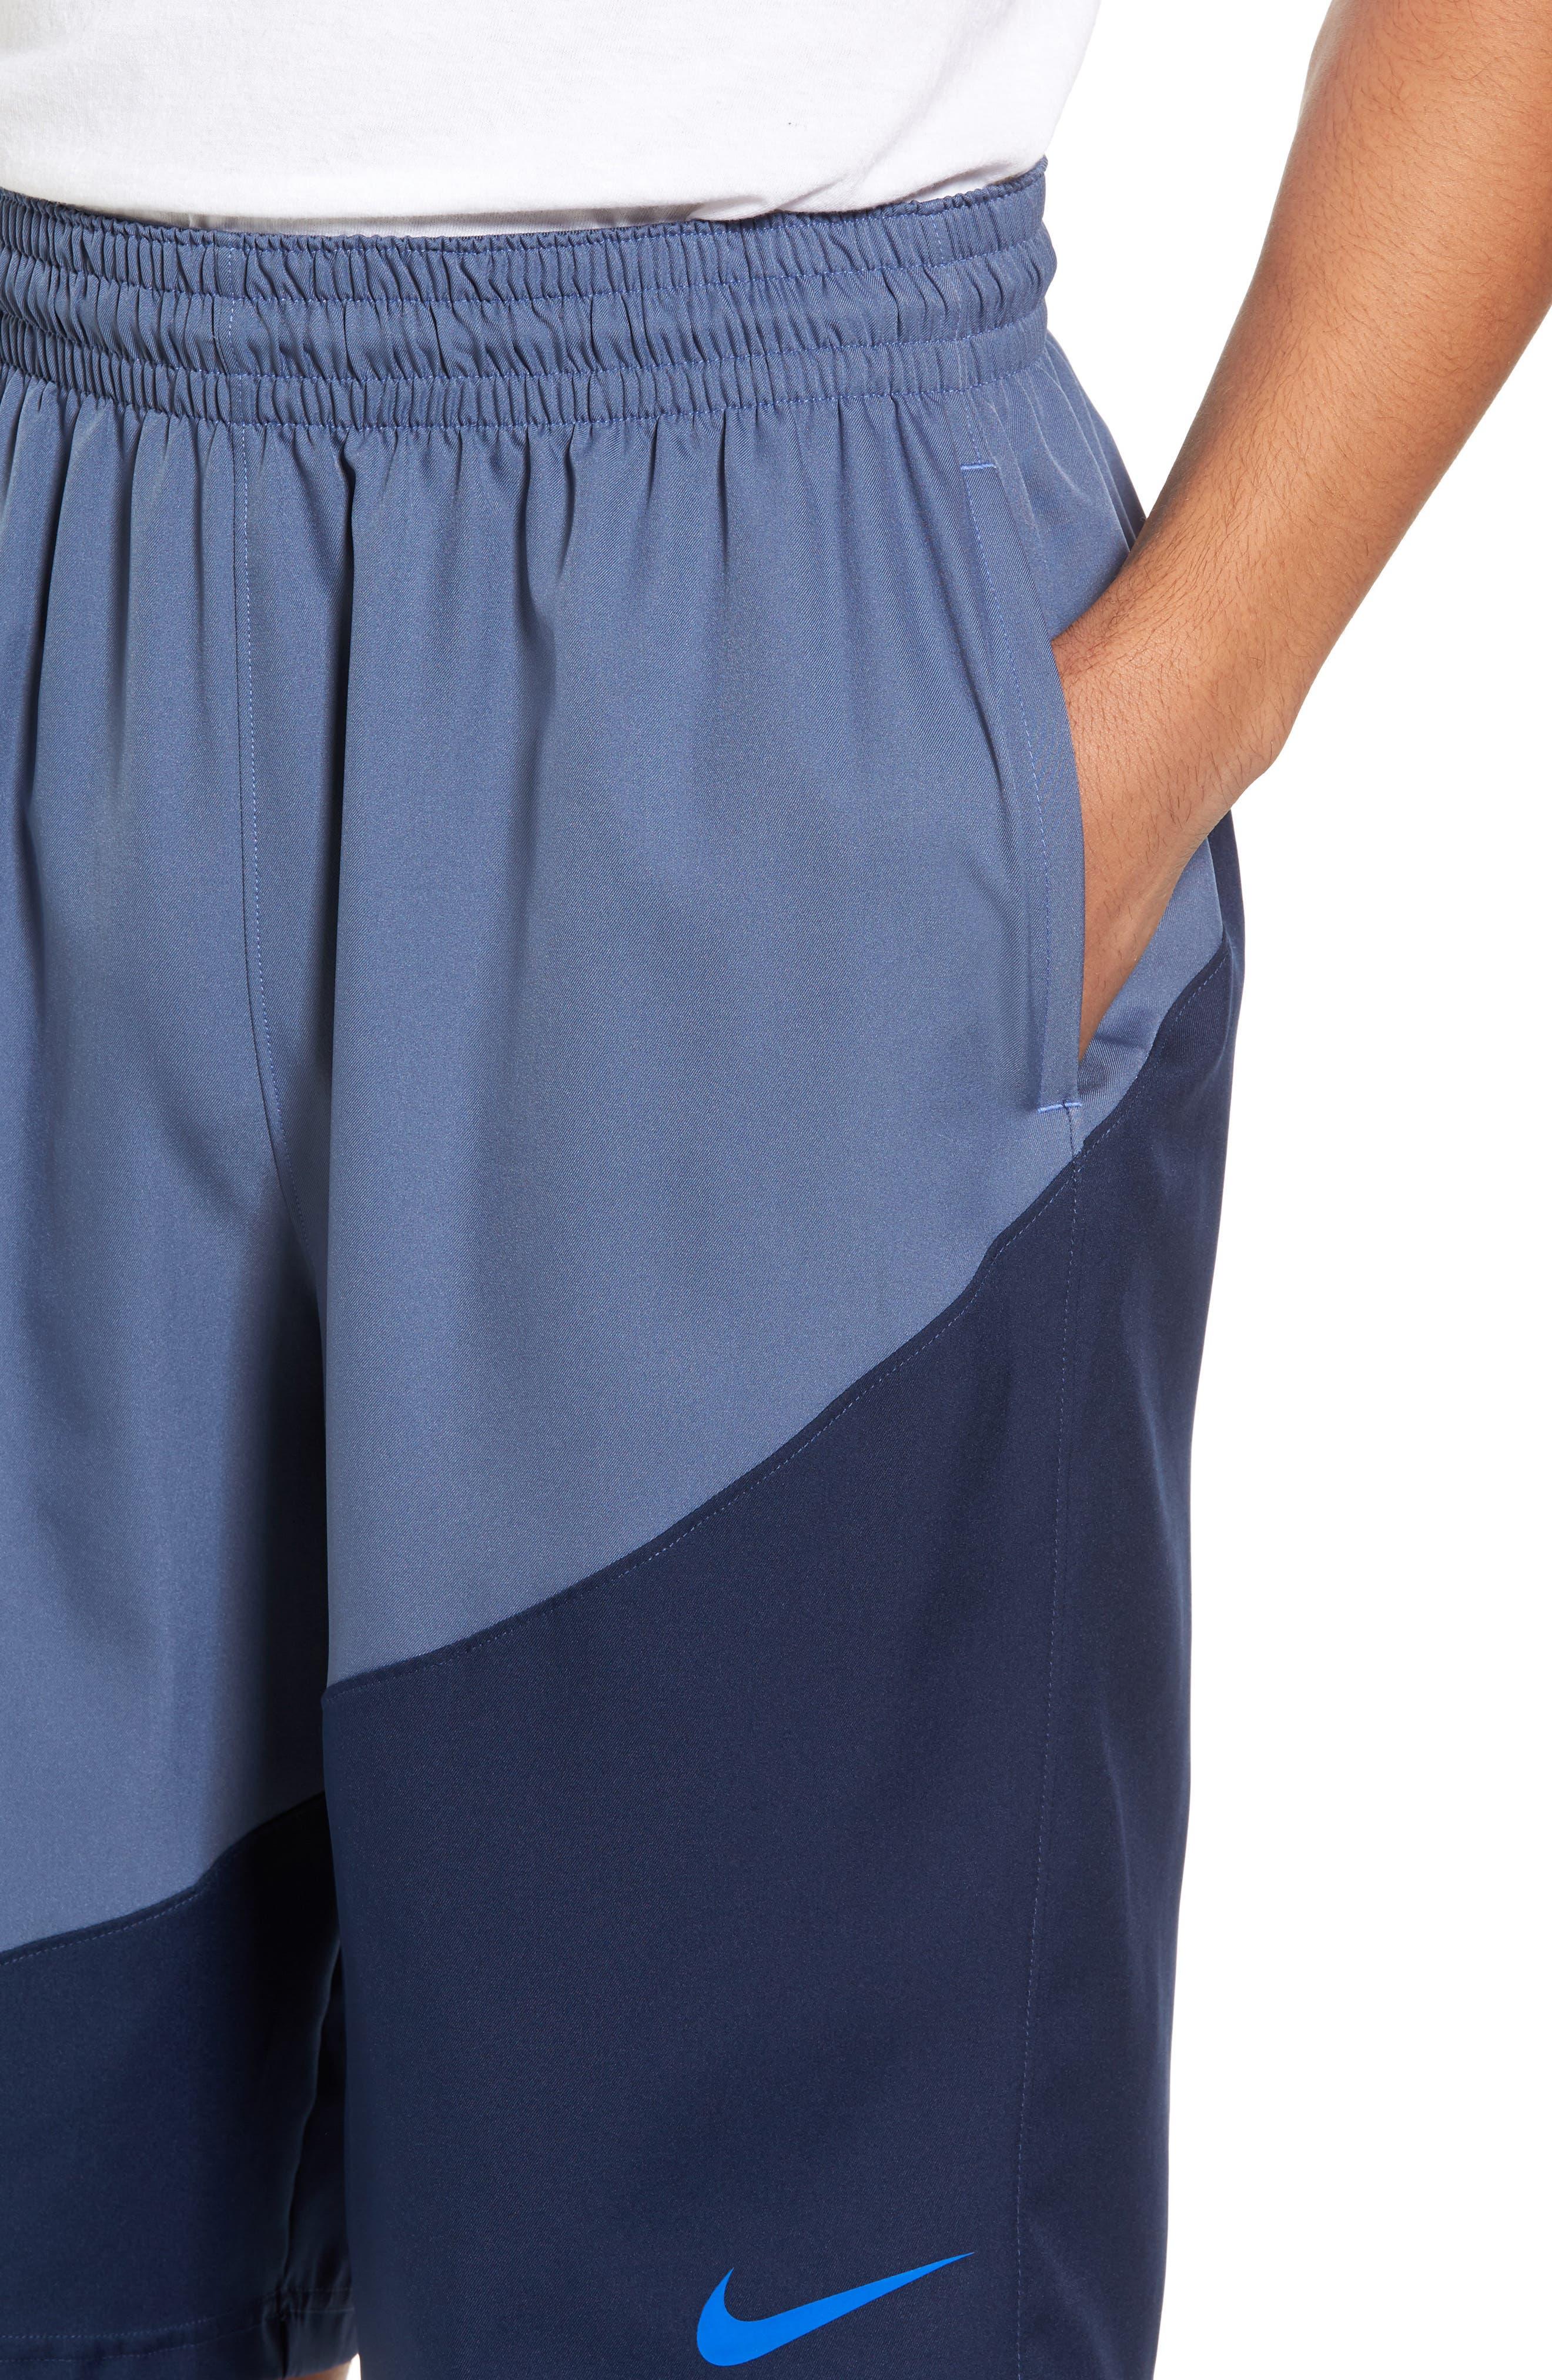 Dry Shorts,                             Alternate thumbnail 12, color,